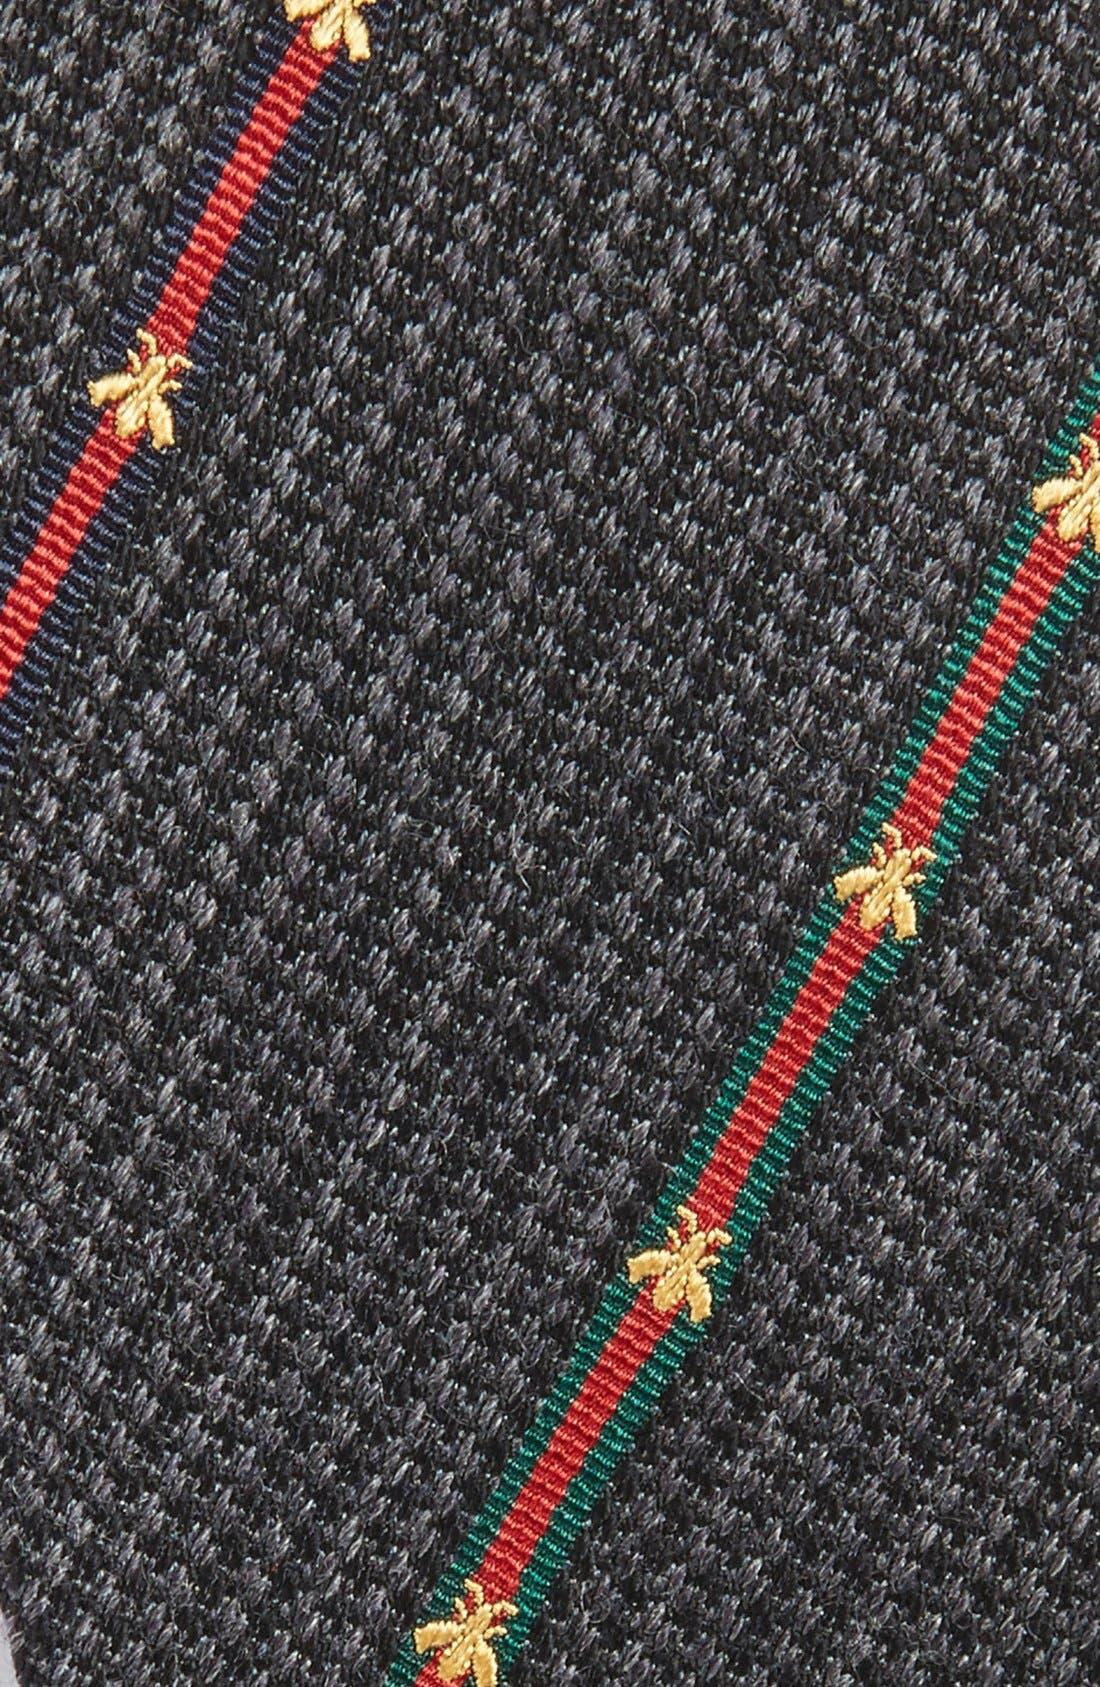 Savanur Silk & Wool Tie,                             Alternate thumbnail 3, color,                             003